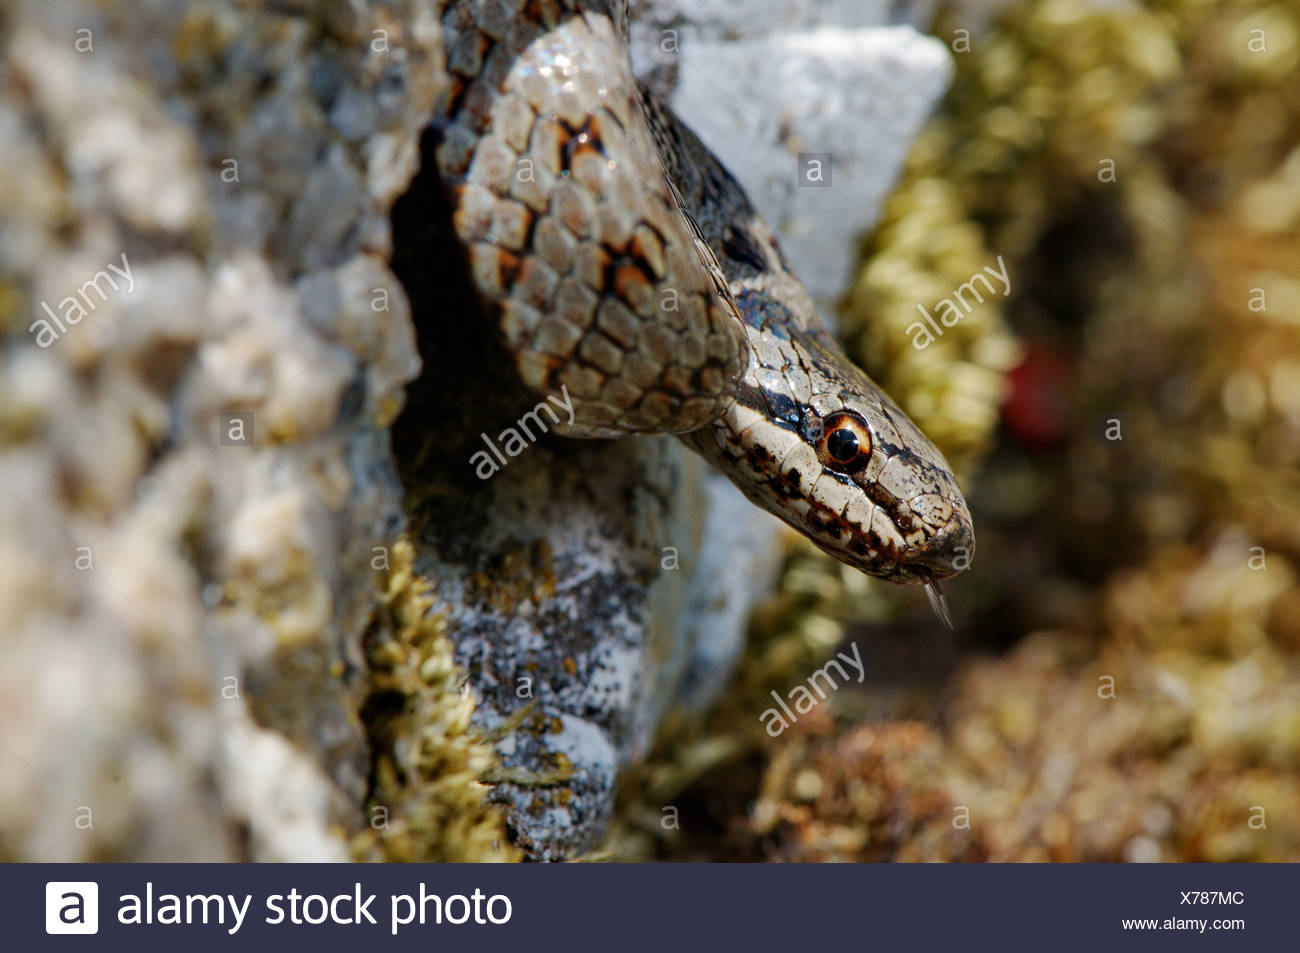 smooth snake, Coronella austriaca, snake, snakes, reptile, reptiles, portrait, protected, endangered, indigenous, non-venomous, - Stock Image